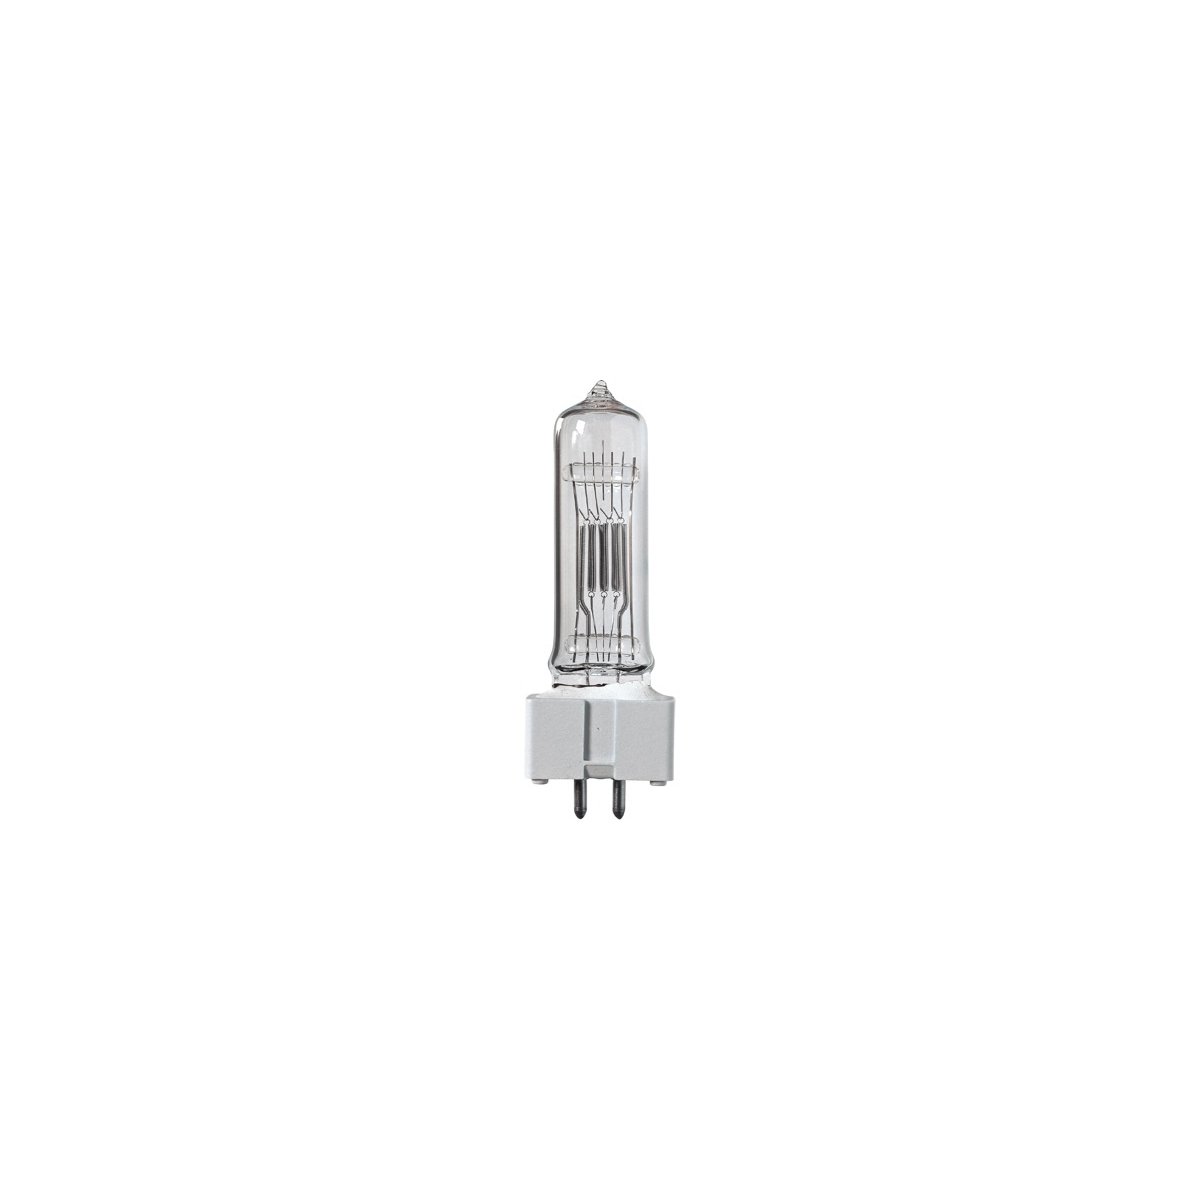 Ampoules halogènes - Osram / GE / Philips - CP24/70